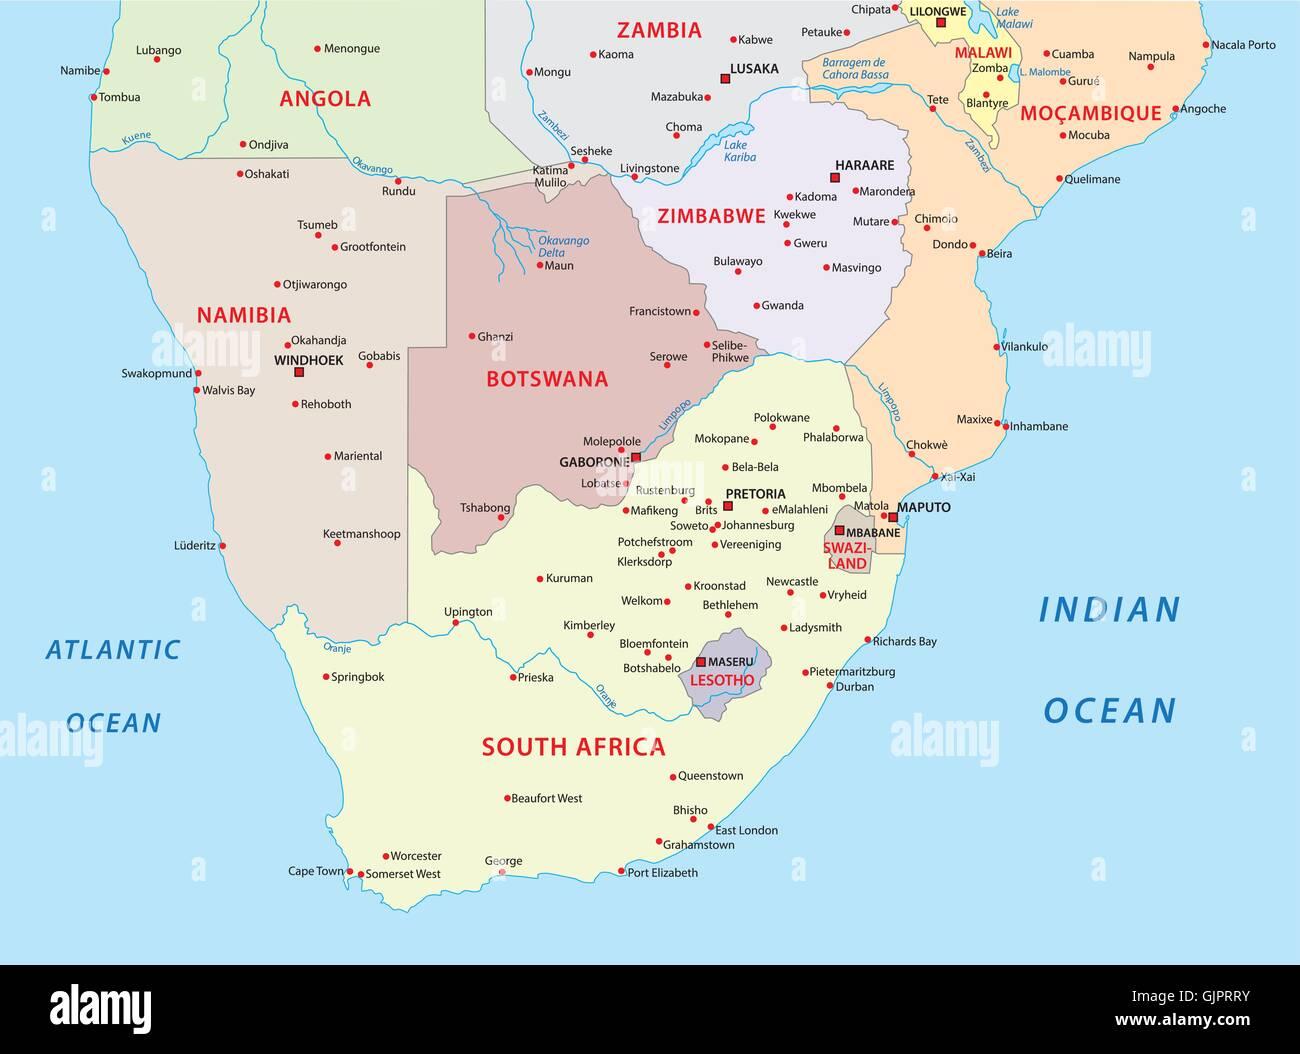 Mappa Stati Africa Wwwtollebildcom